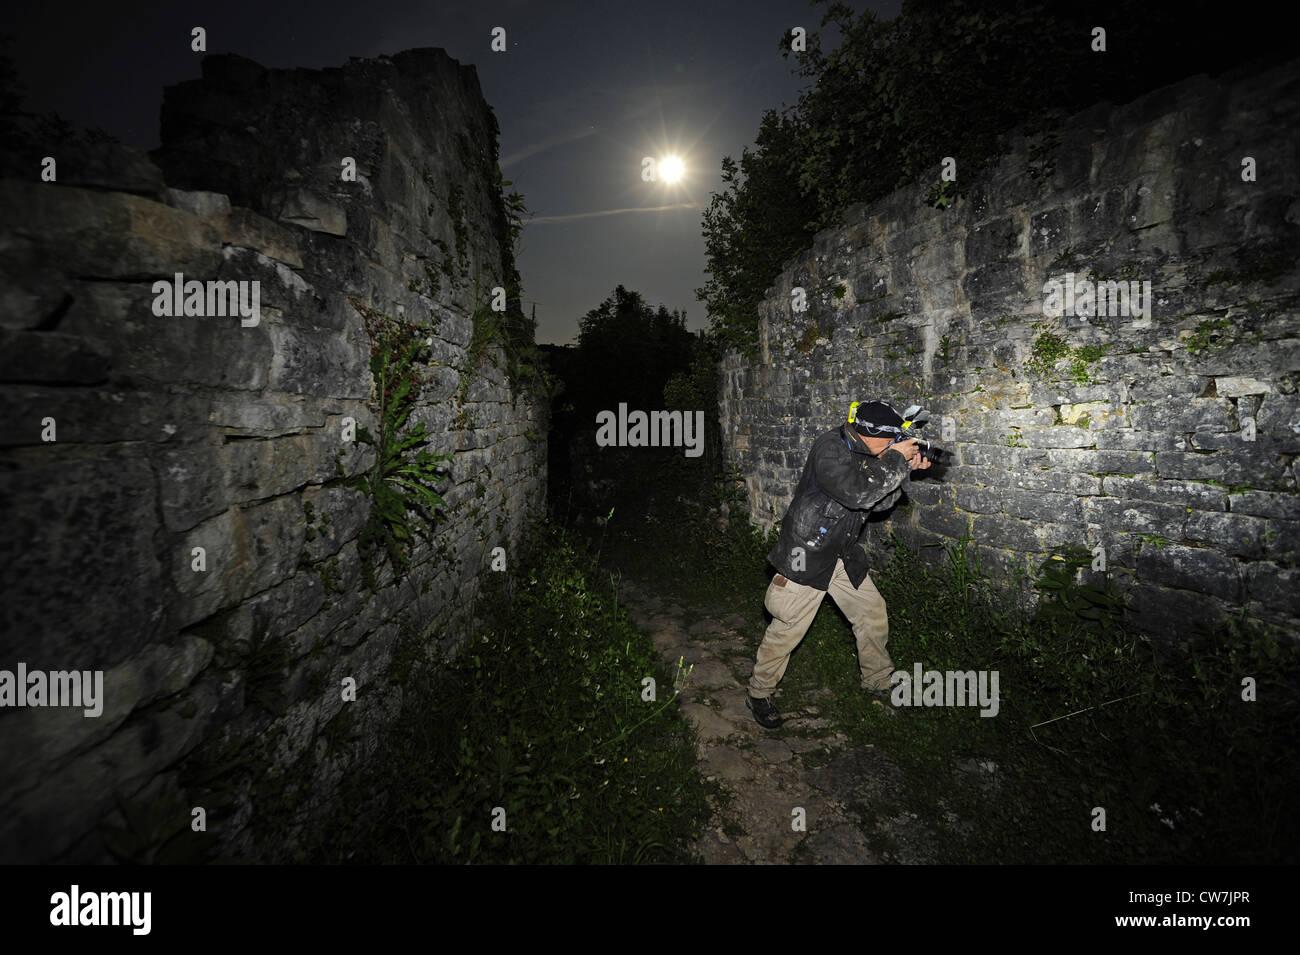 photographer in the castle ruin of Dvigrad at full moon searching geckos, Croatia, Dvigrad - Stock Image